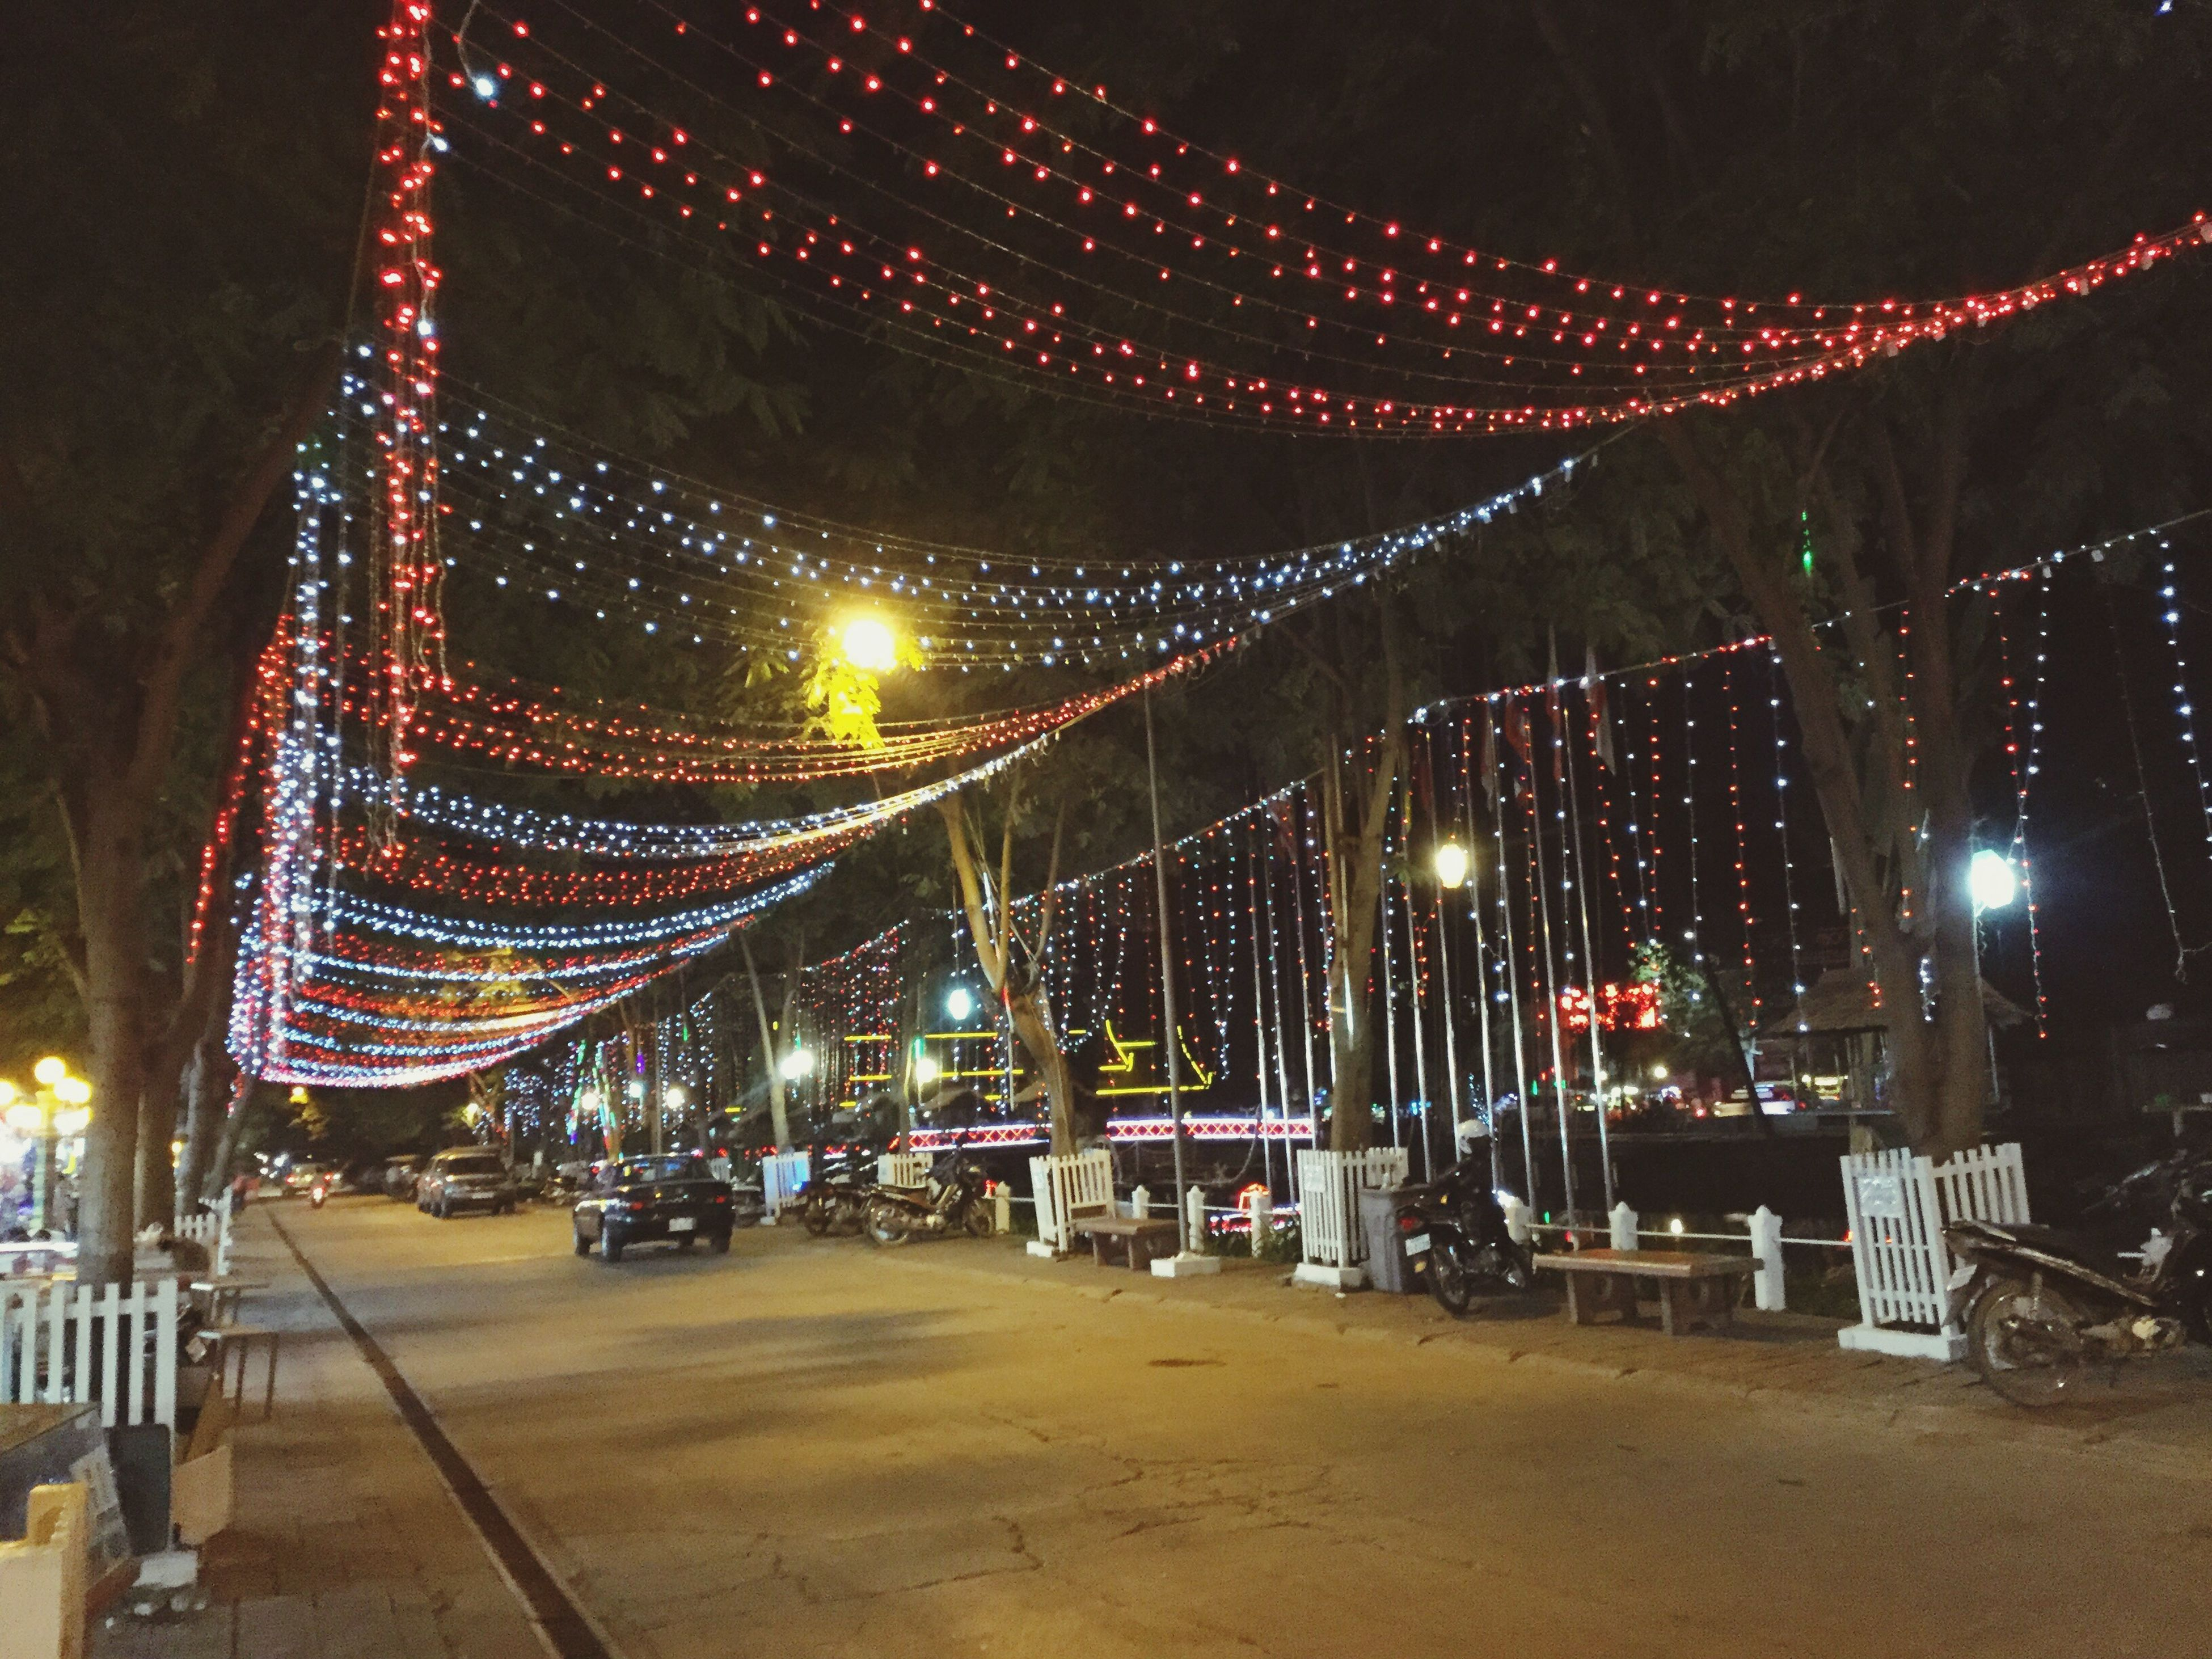 illuminated, night, no people, christmas lights, city, outdoors, christmas, sky, christmas decoration, architecture